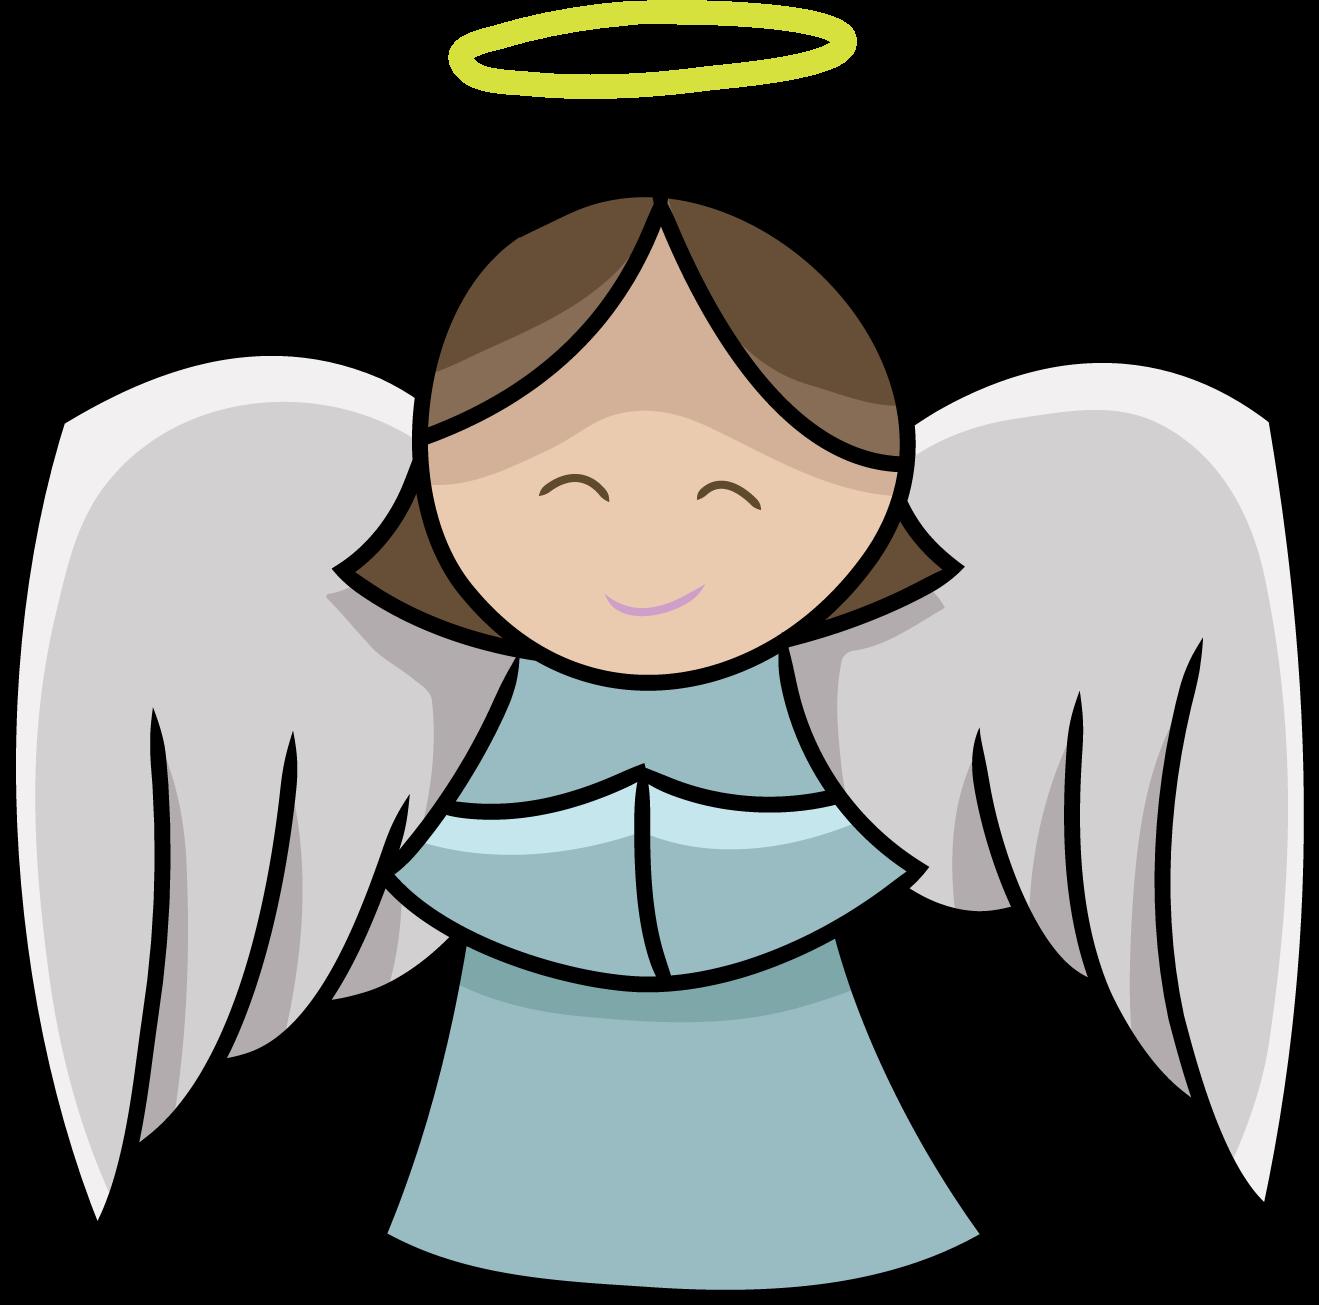 1319x1305 Angel Clip Art Free Cute Amp Lovely Angel Clip Art Things